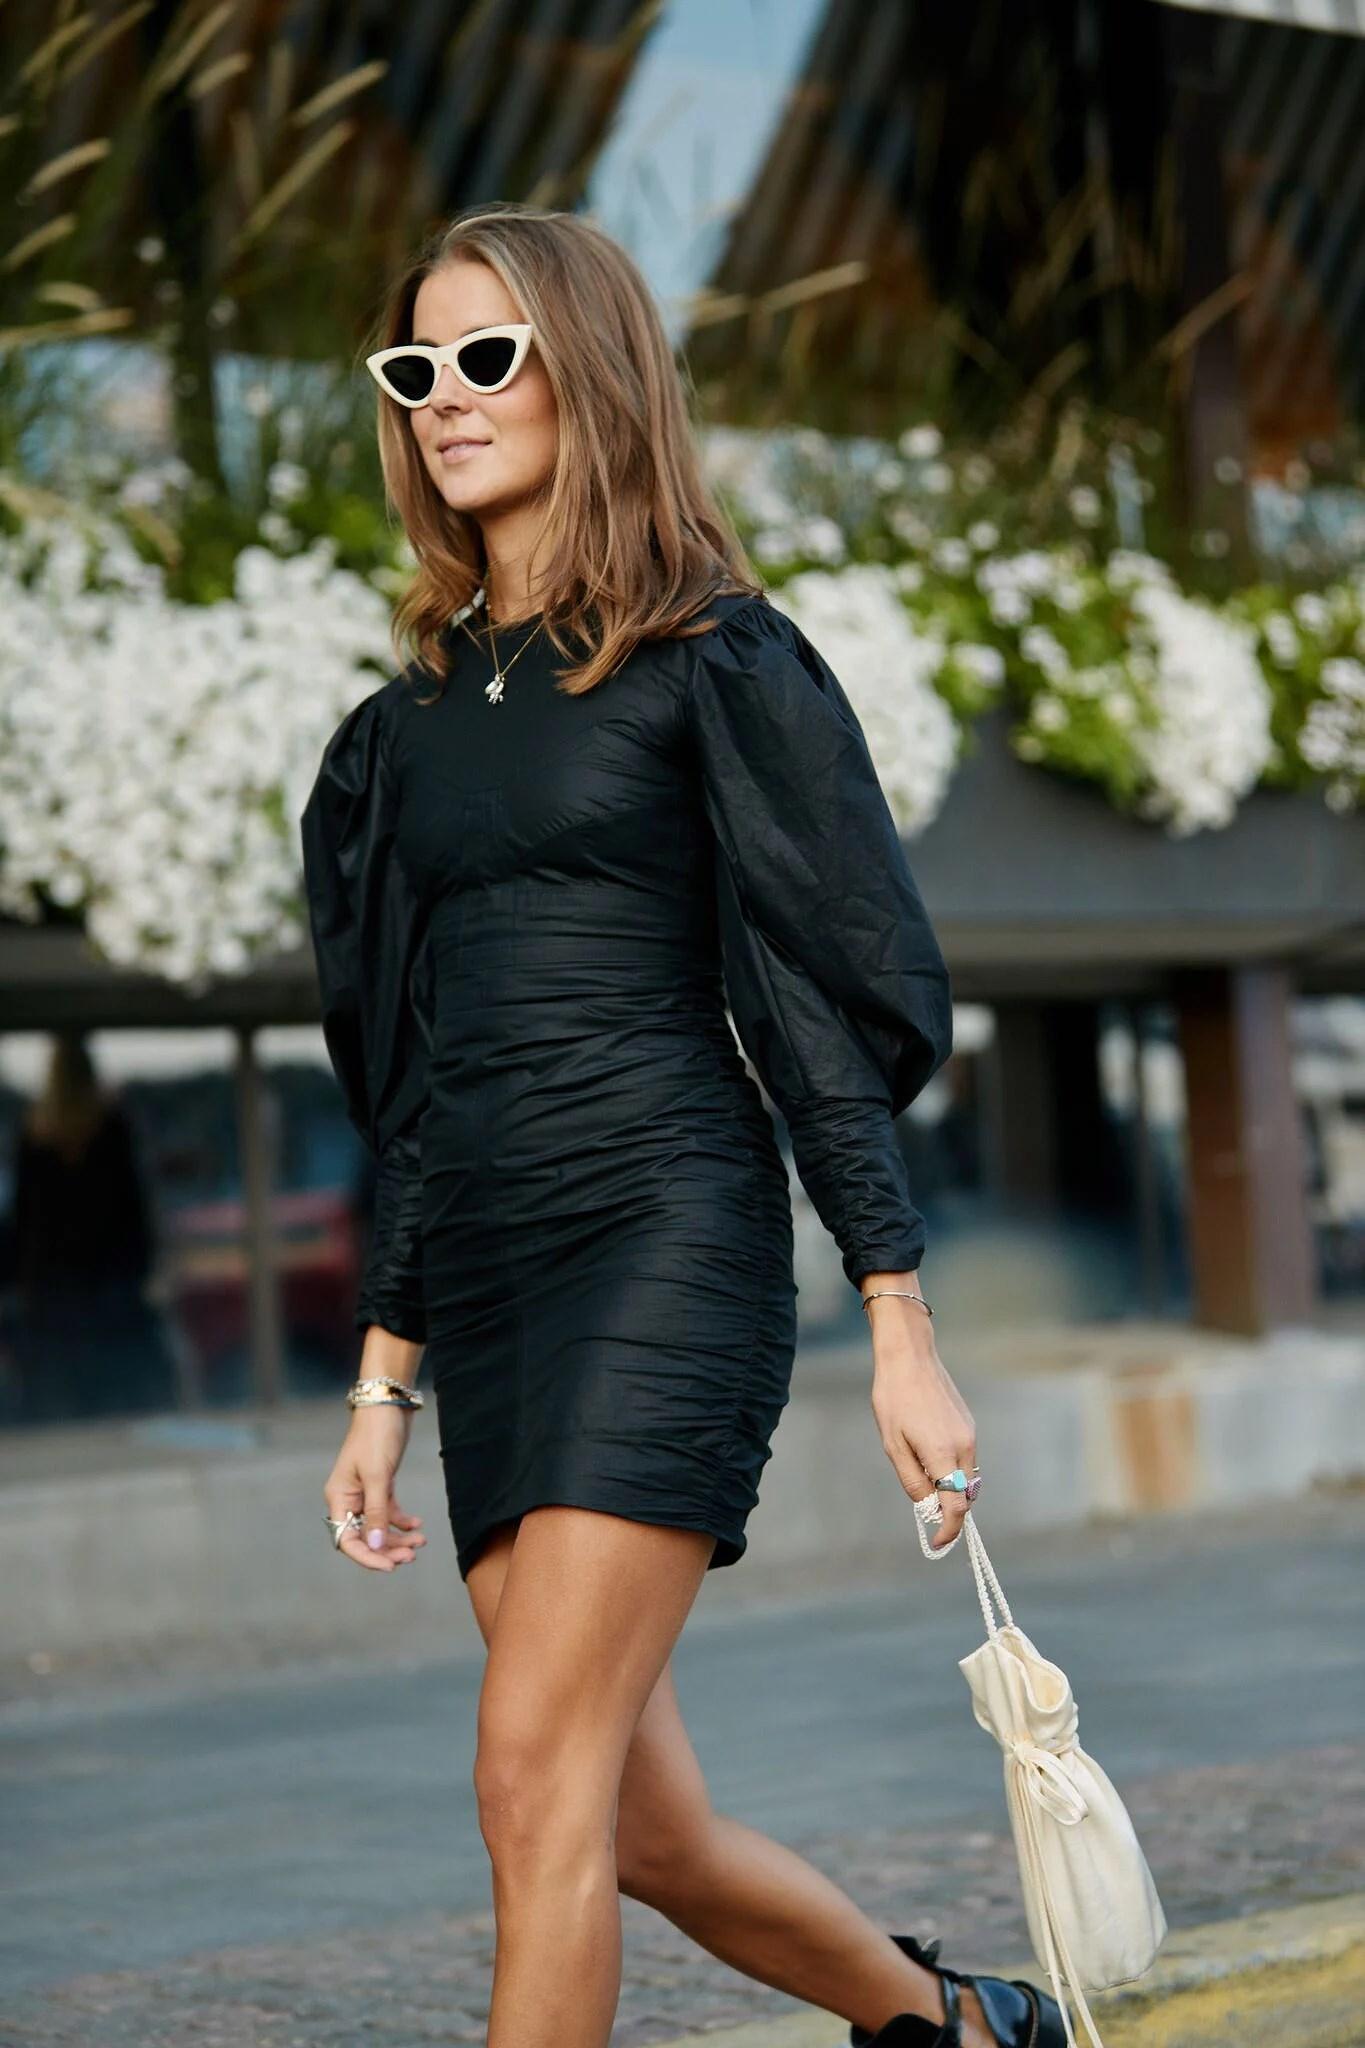 Dressed in black!